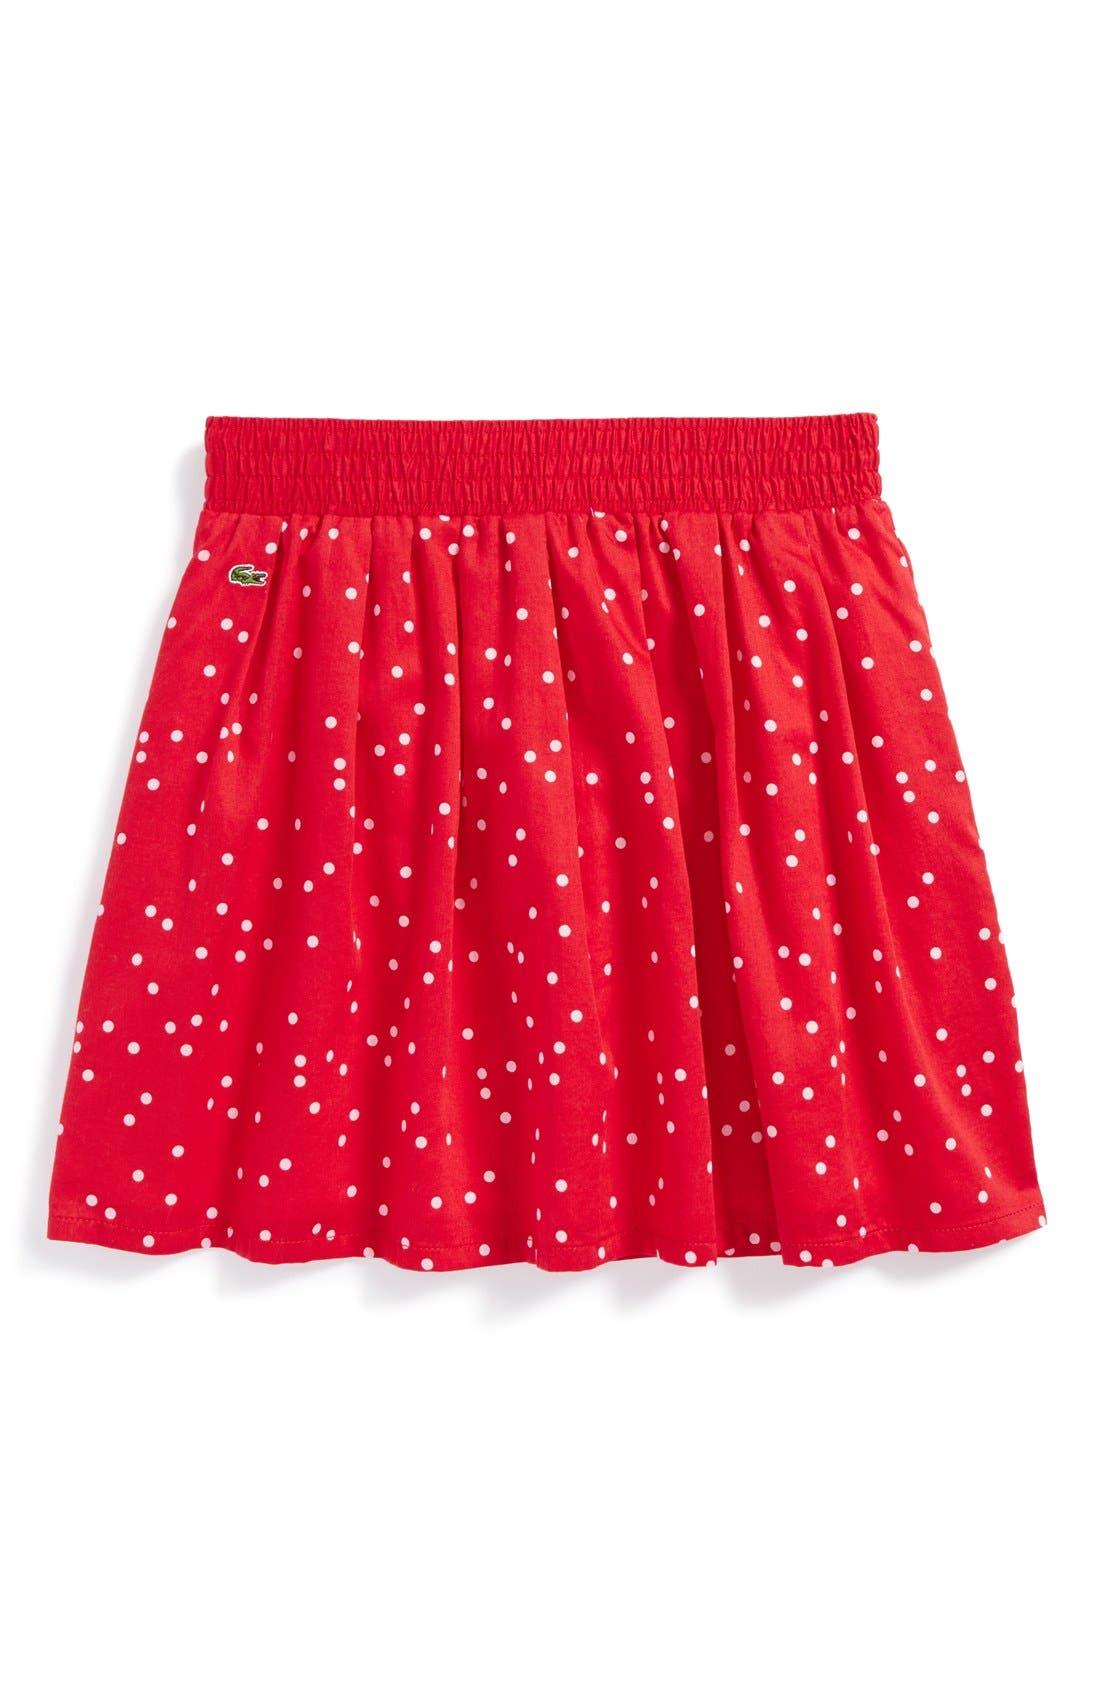 Main Image - Lacoste Dot Skirt (Big Girls)